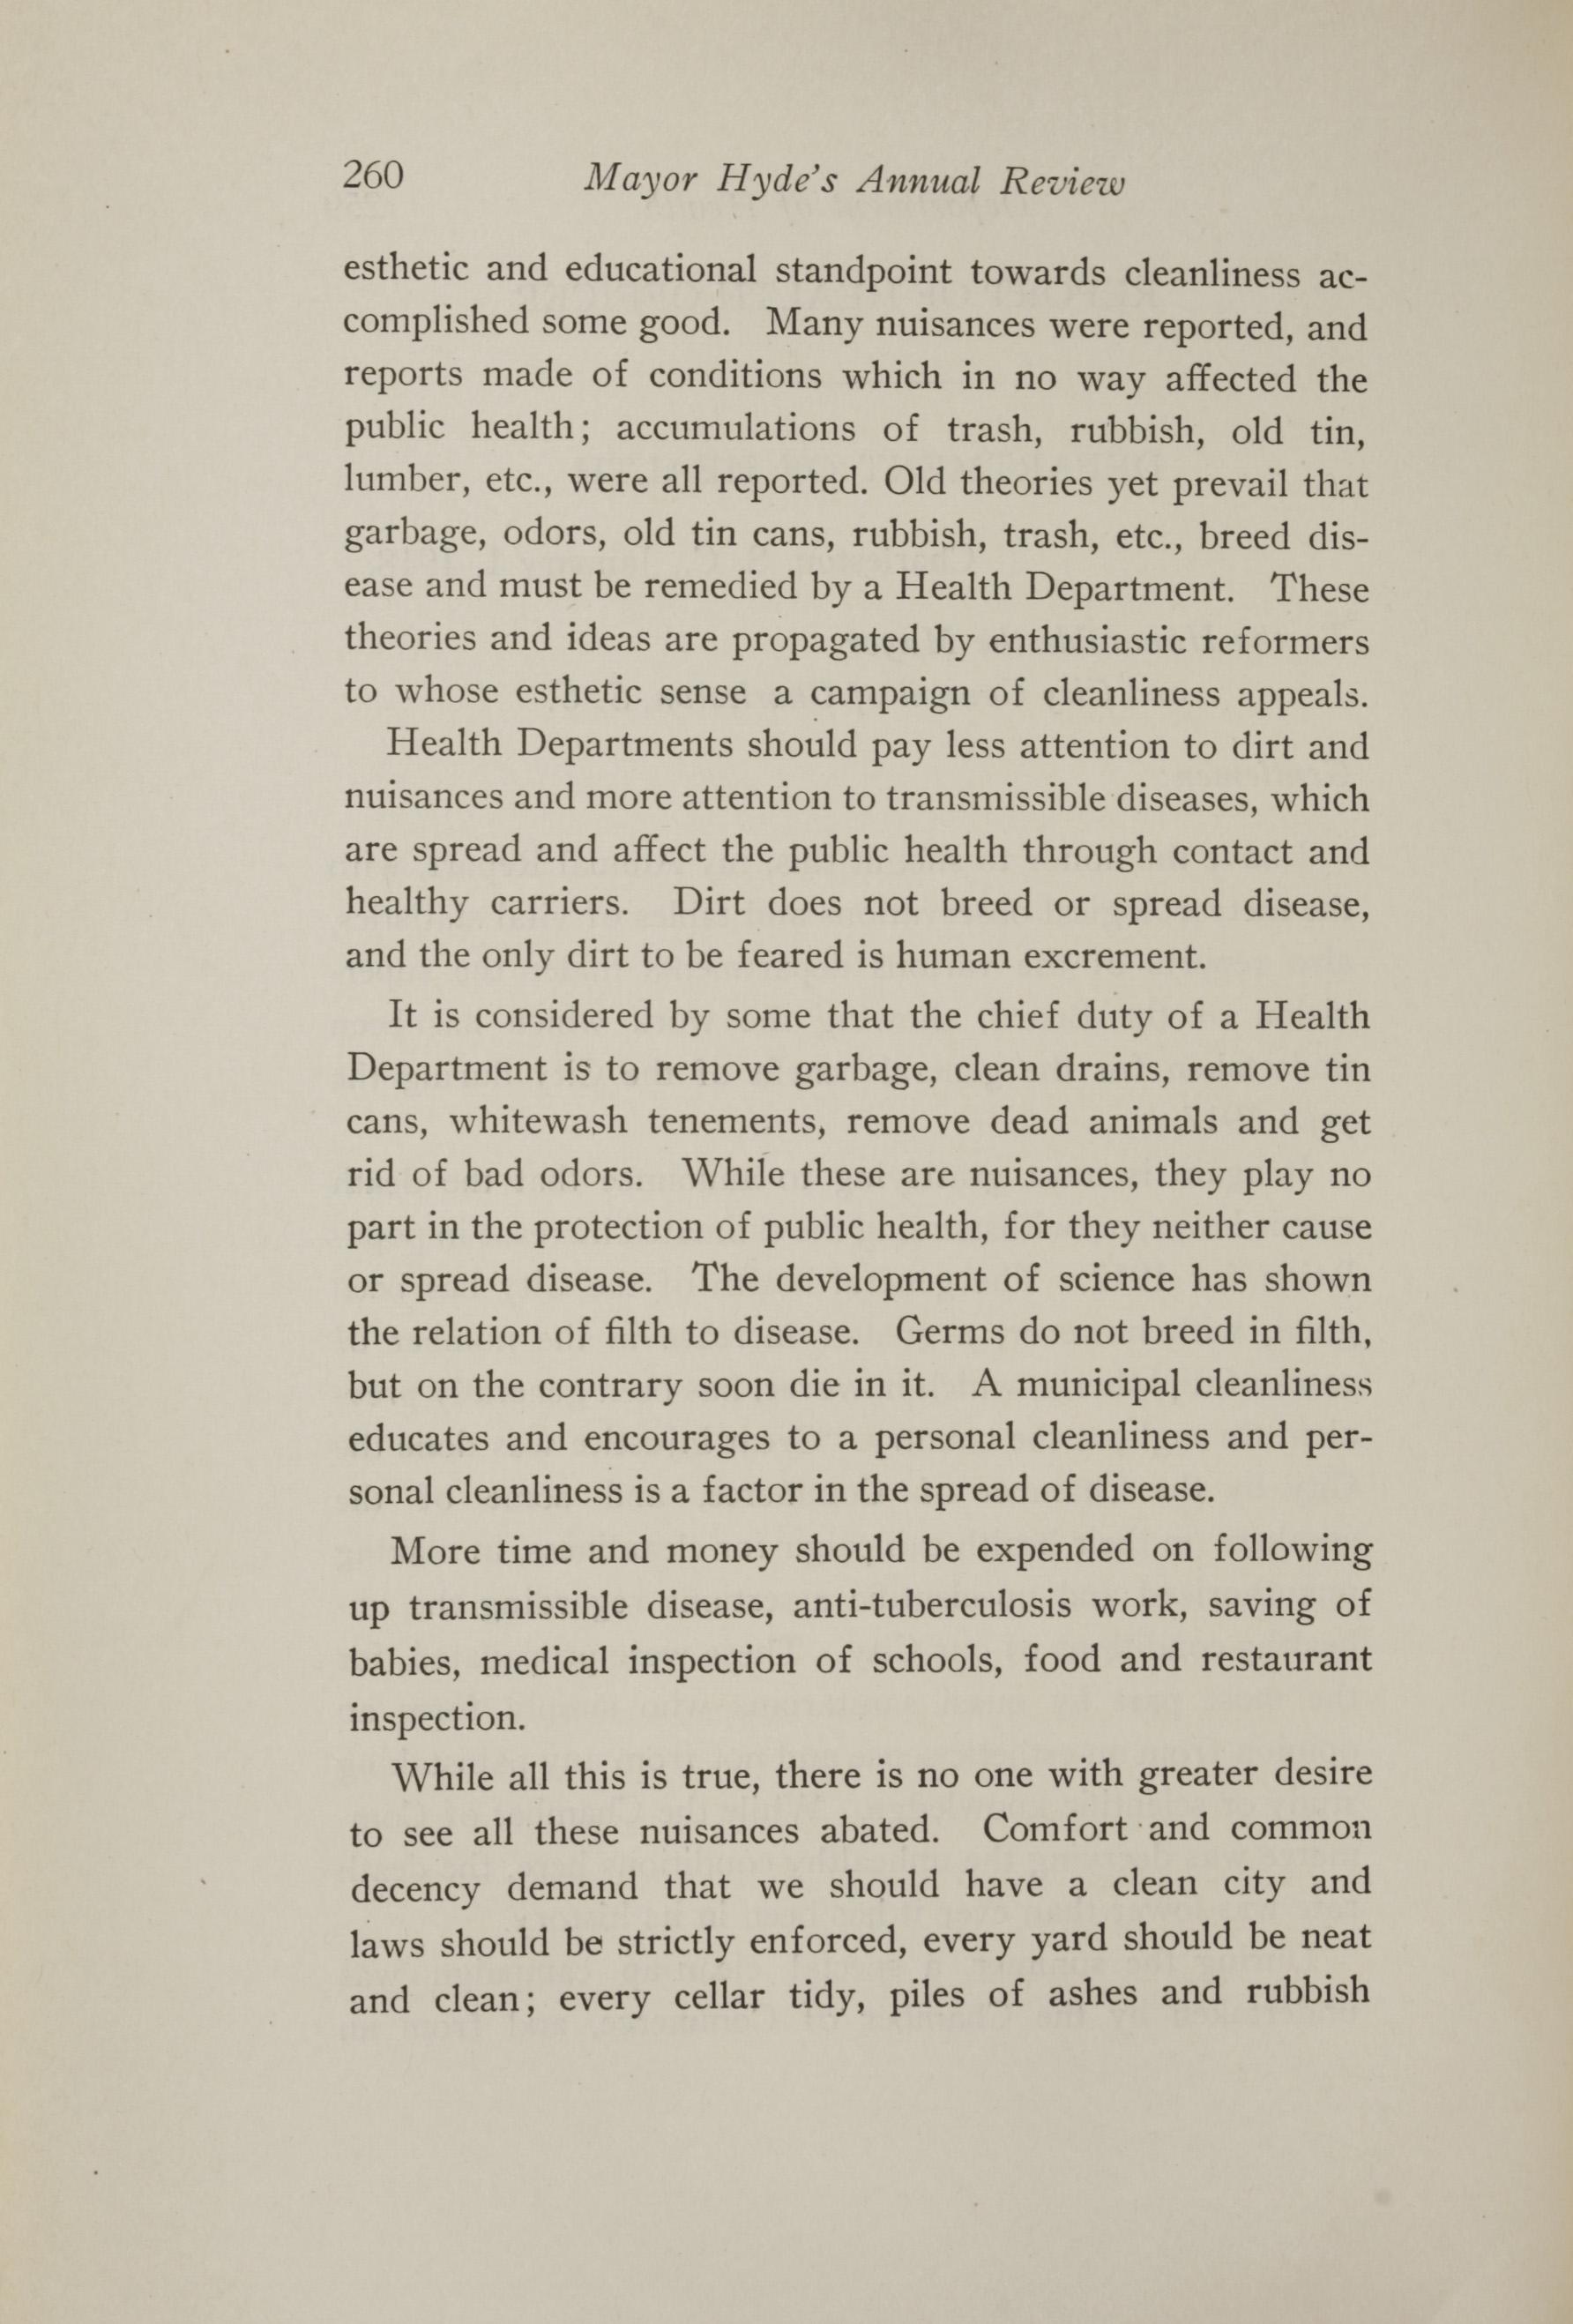 Charleston Yearbook, 1917, page 260